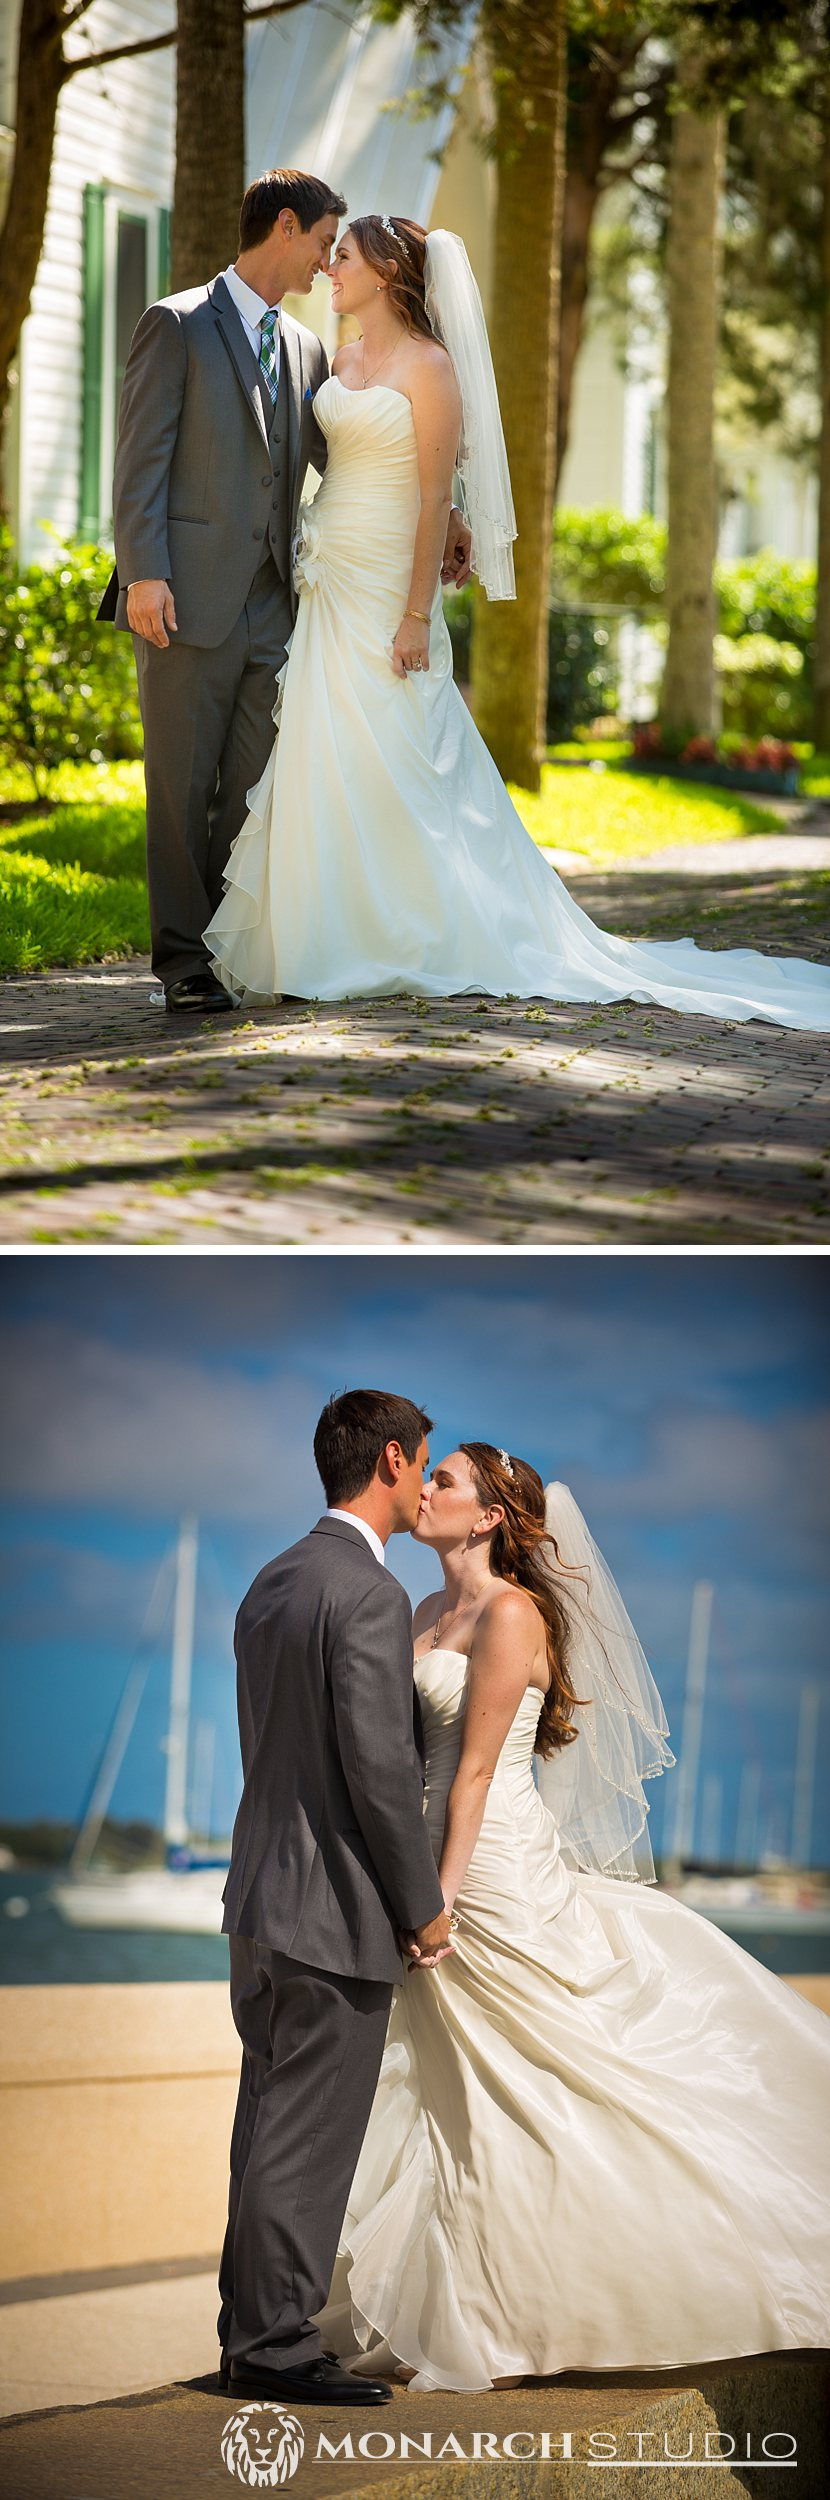 Treasury-on-The-Plaza-Wedding-Reception_0026.jpg